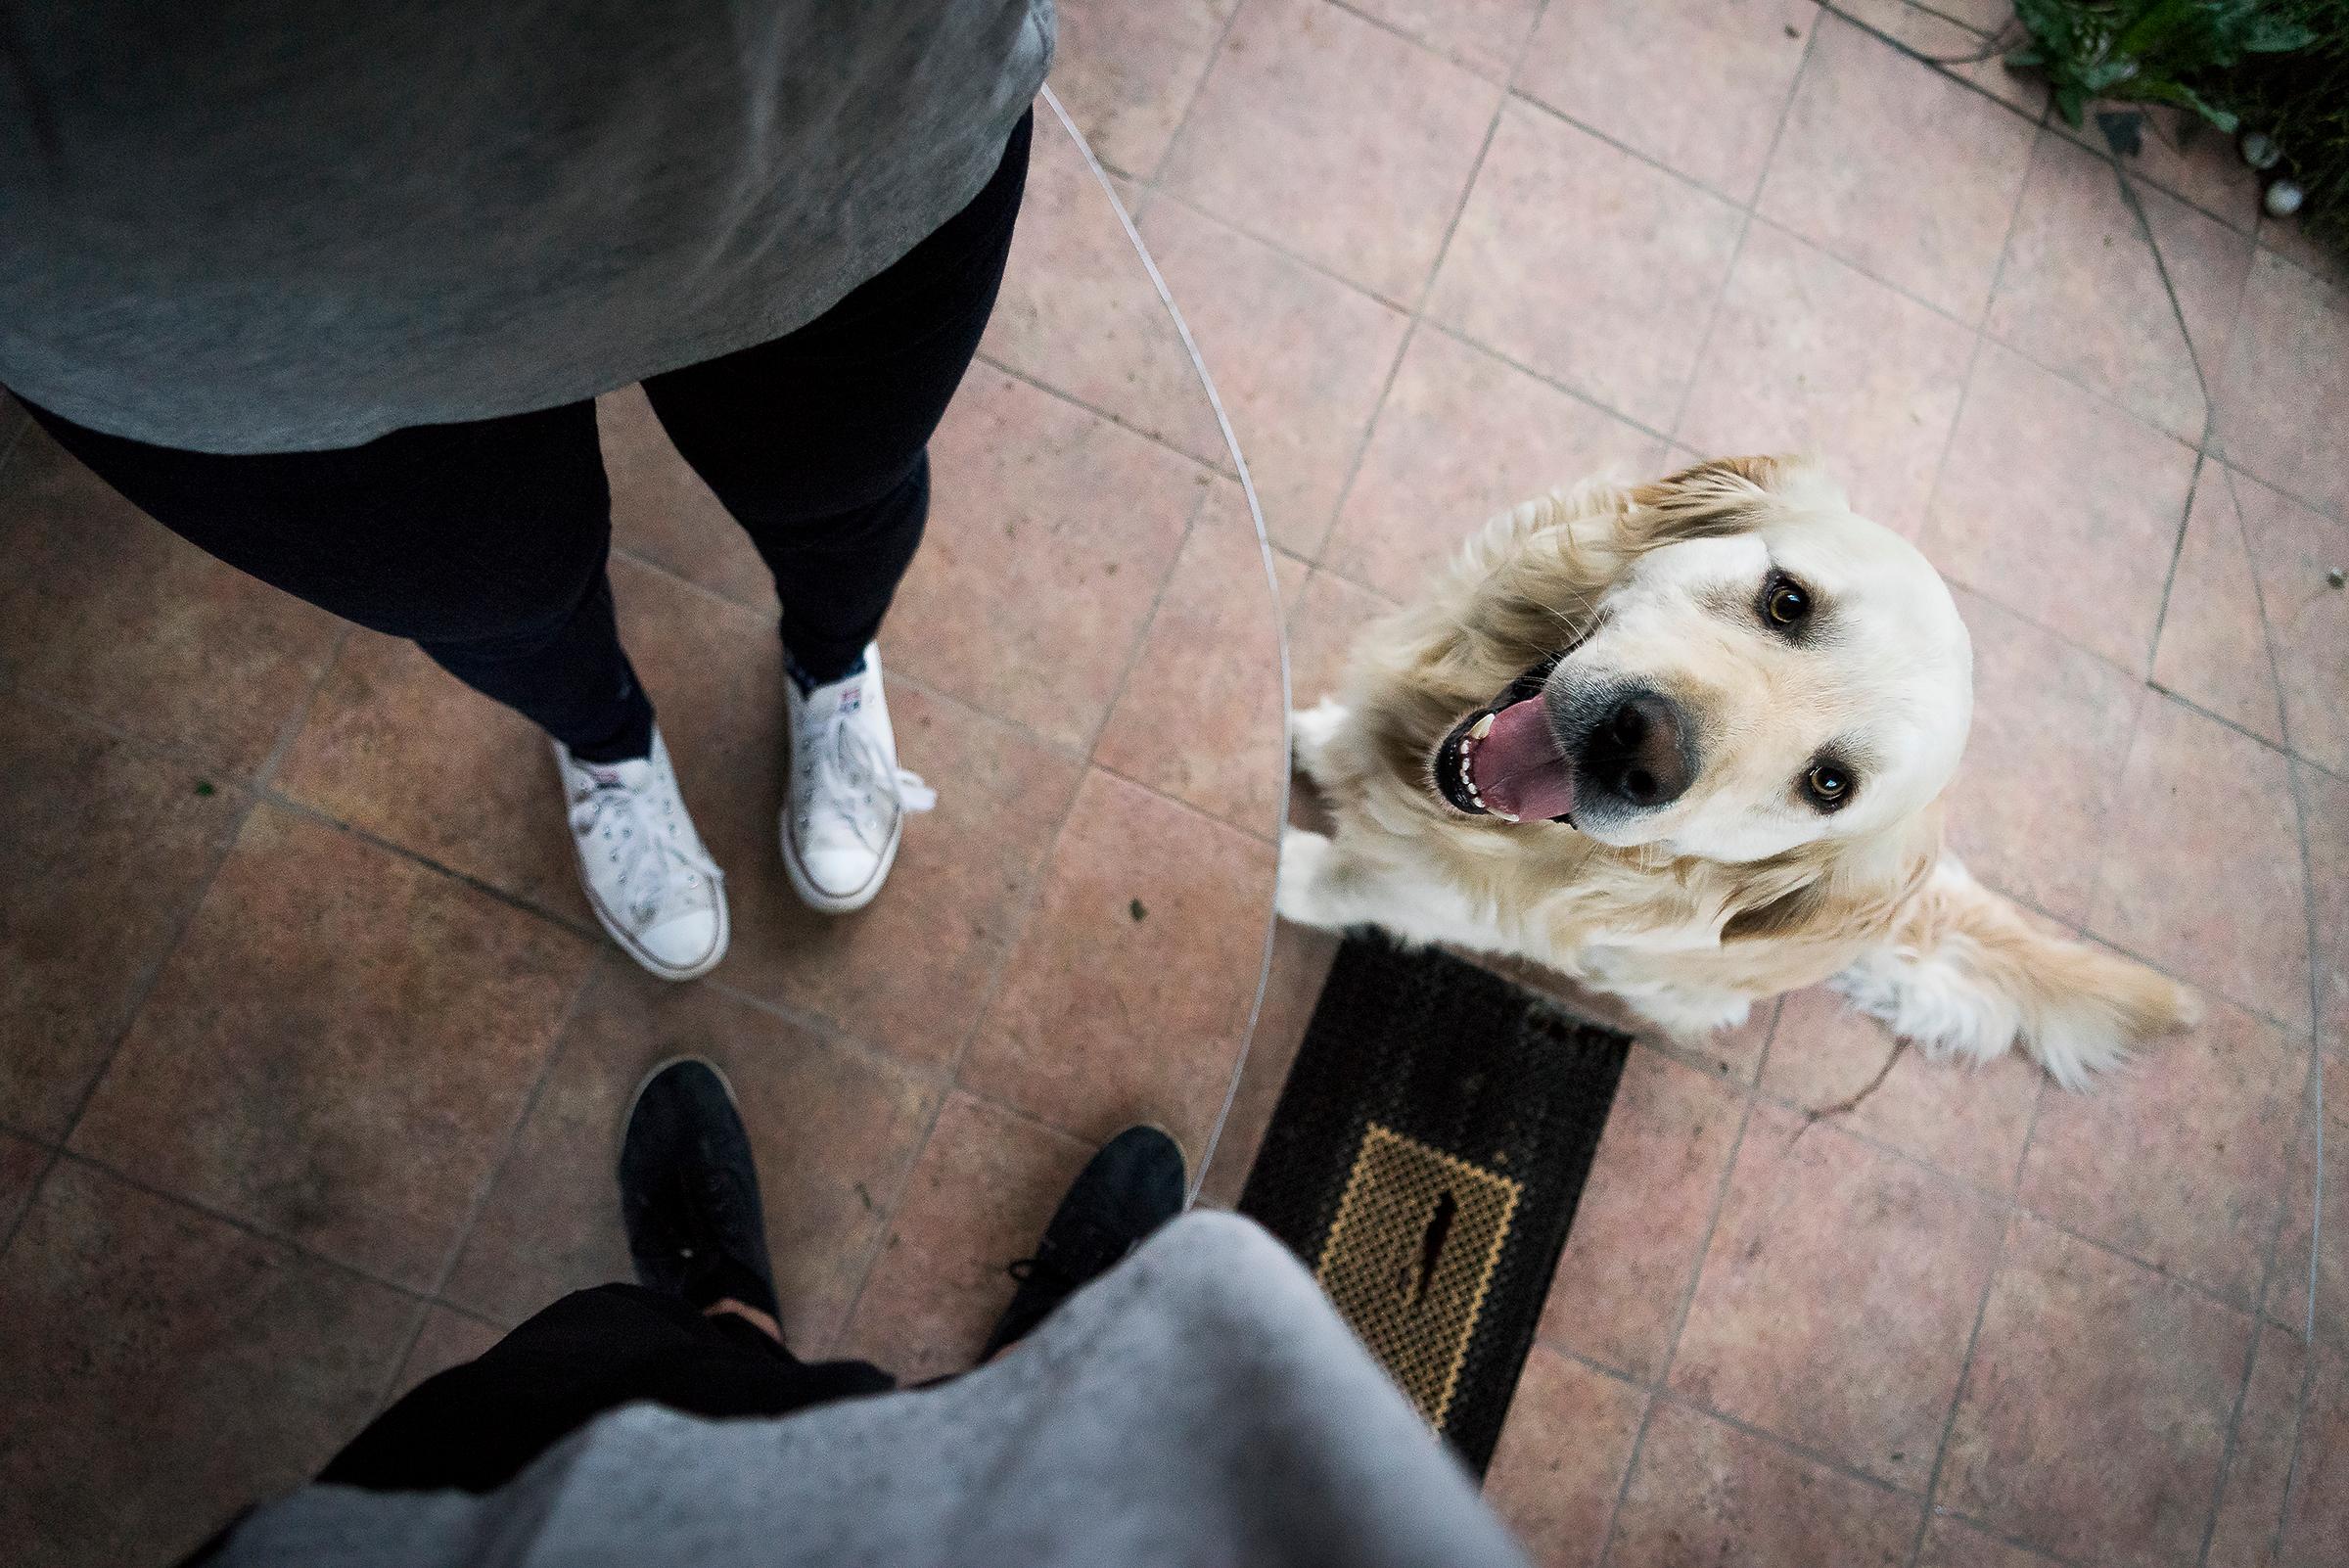 # Prologue - 개 좋아하세요? - 개를 좋아한다고 ...